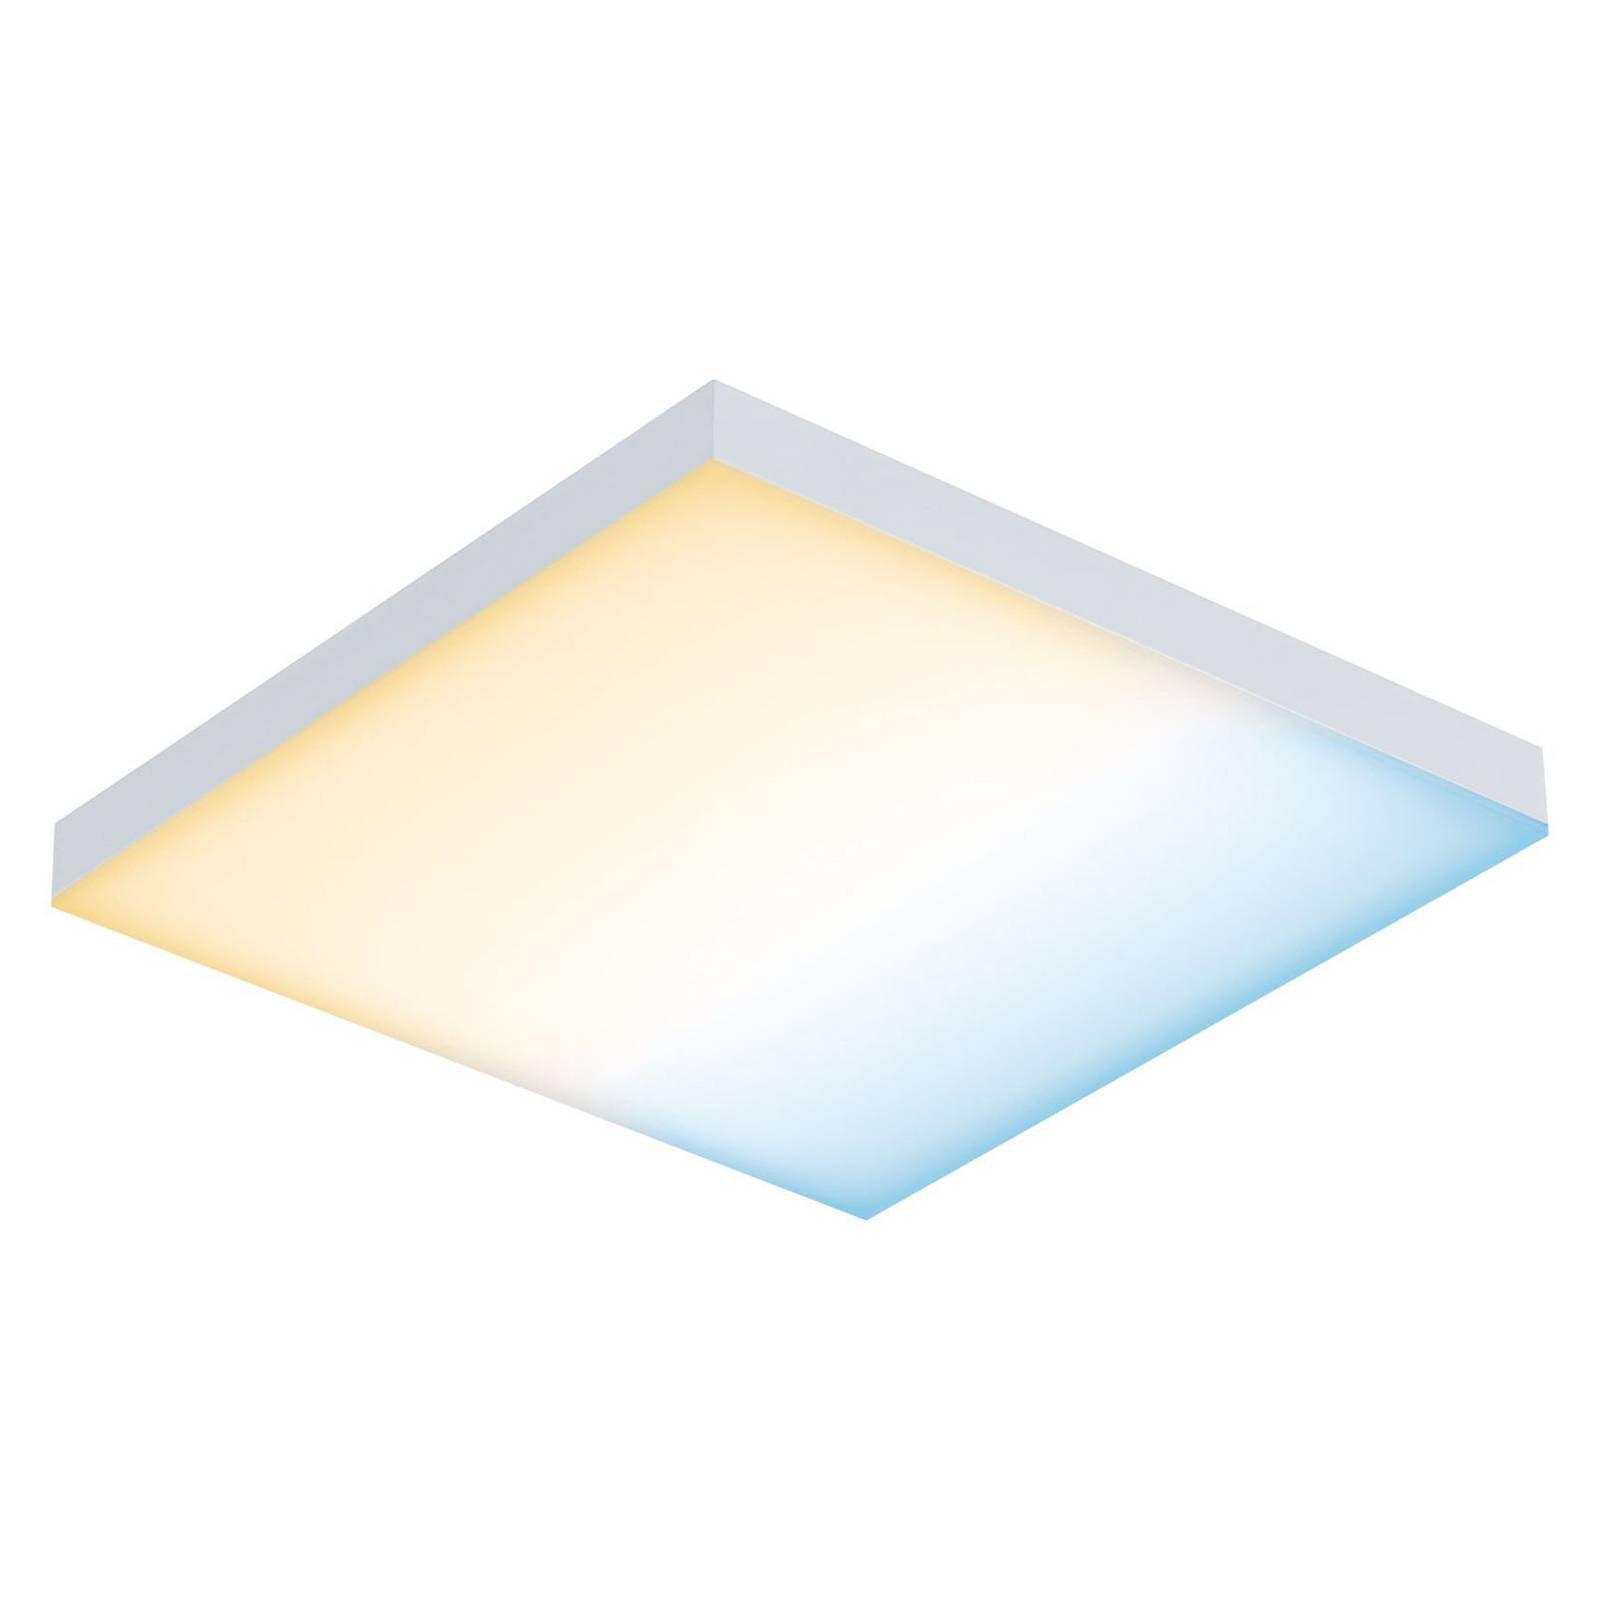 Paulmann Velora LED-panel Zigbee 22,5x22,5cm 8,5W